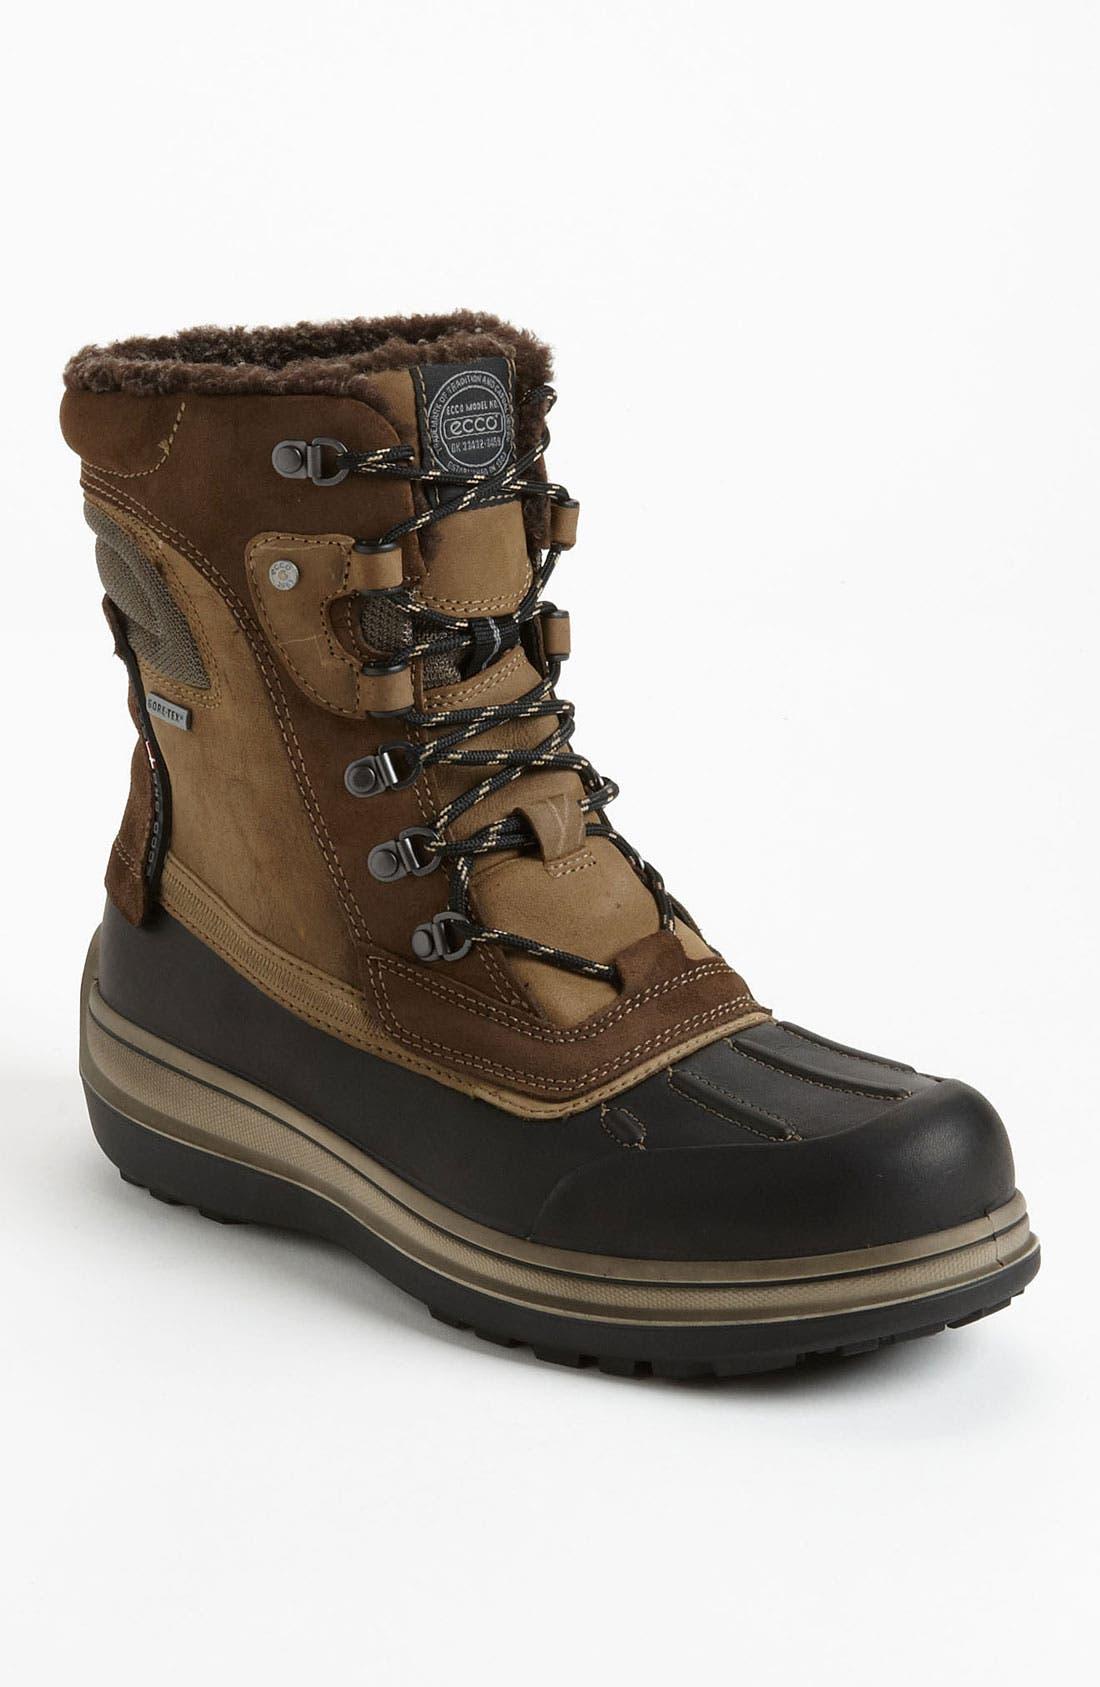 Main Image - ECCO 'Roxton' Boot